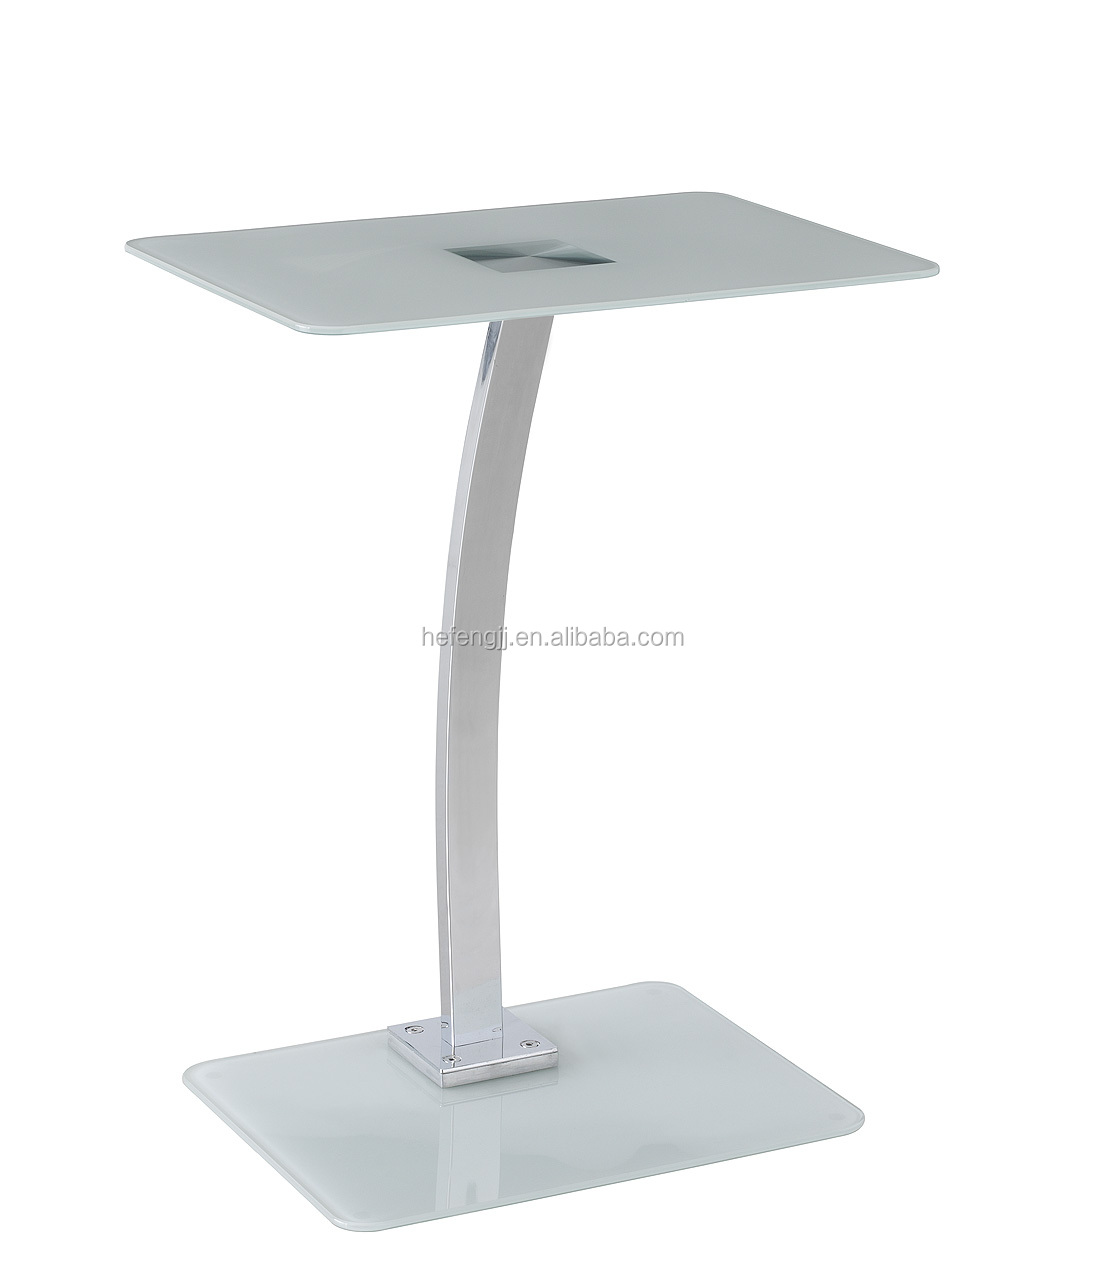 top vente tremp verre table d 39 ordinateur portable table d 39 ordinateur table basse id de produit. Black Bedroom Furniture Sets. Home Design Ideas